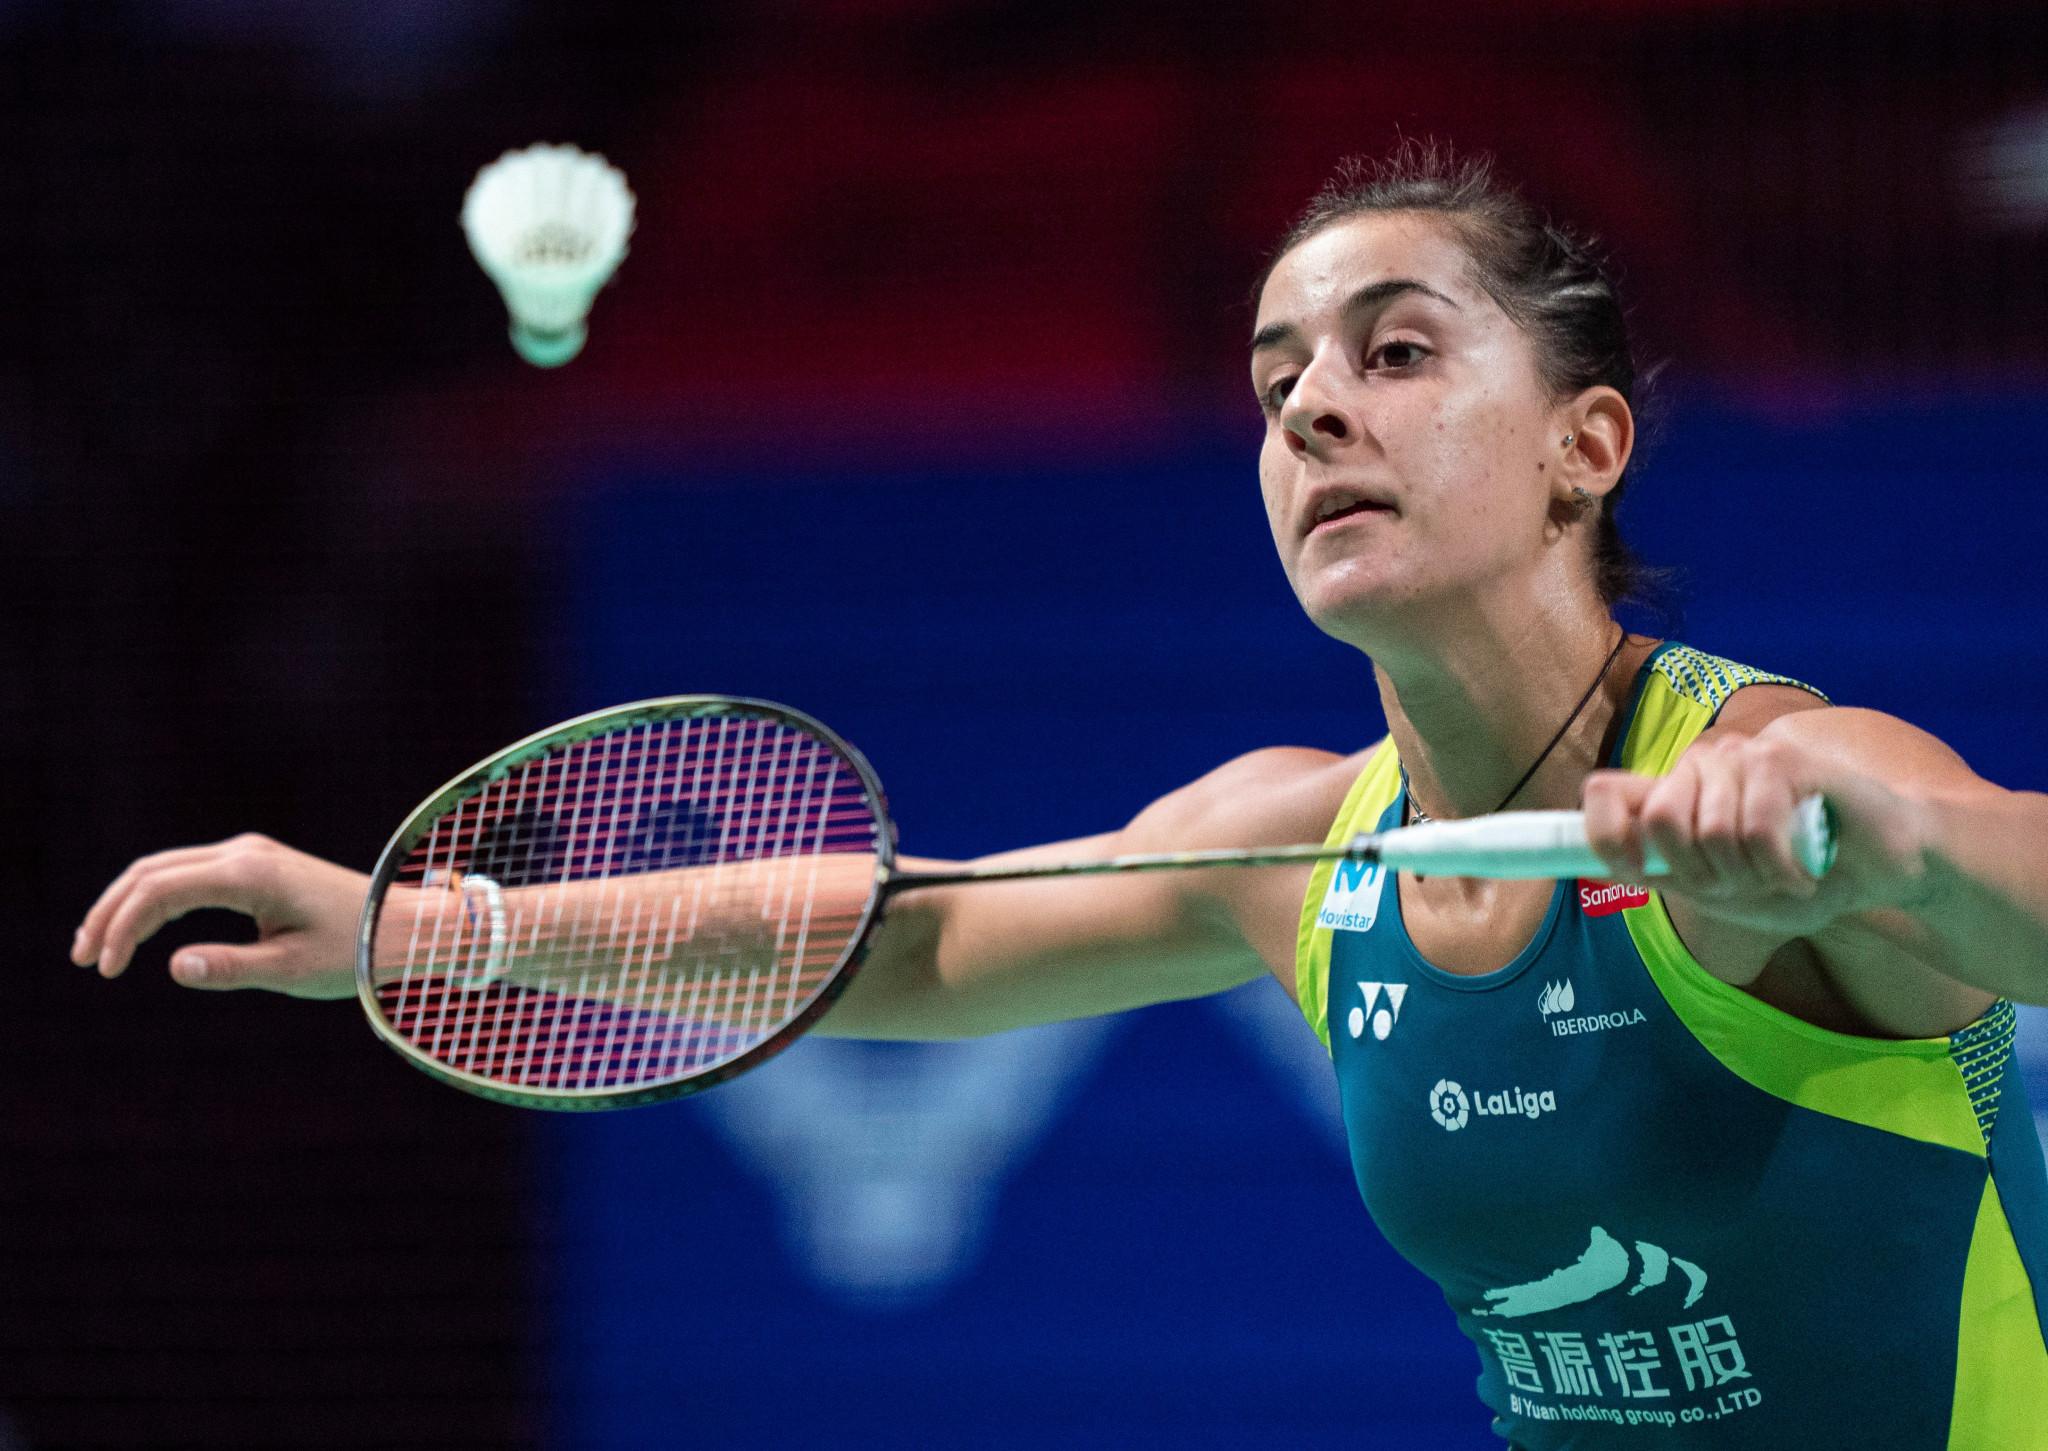 Coronavirus scare delays start of All England Open Badminton Championships